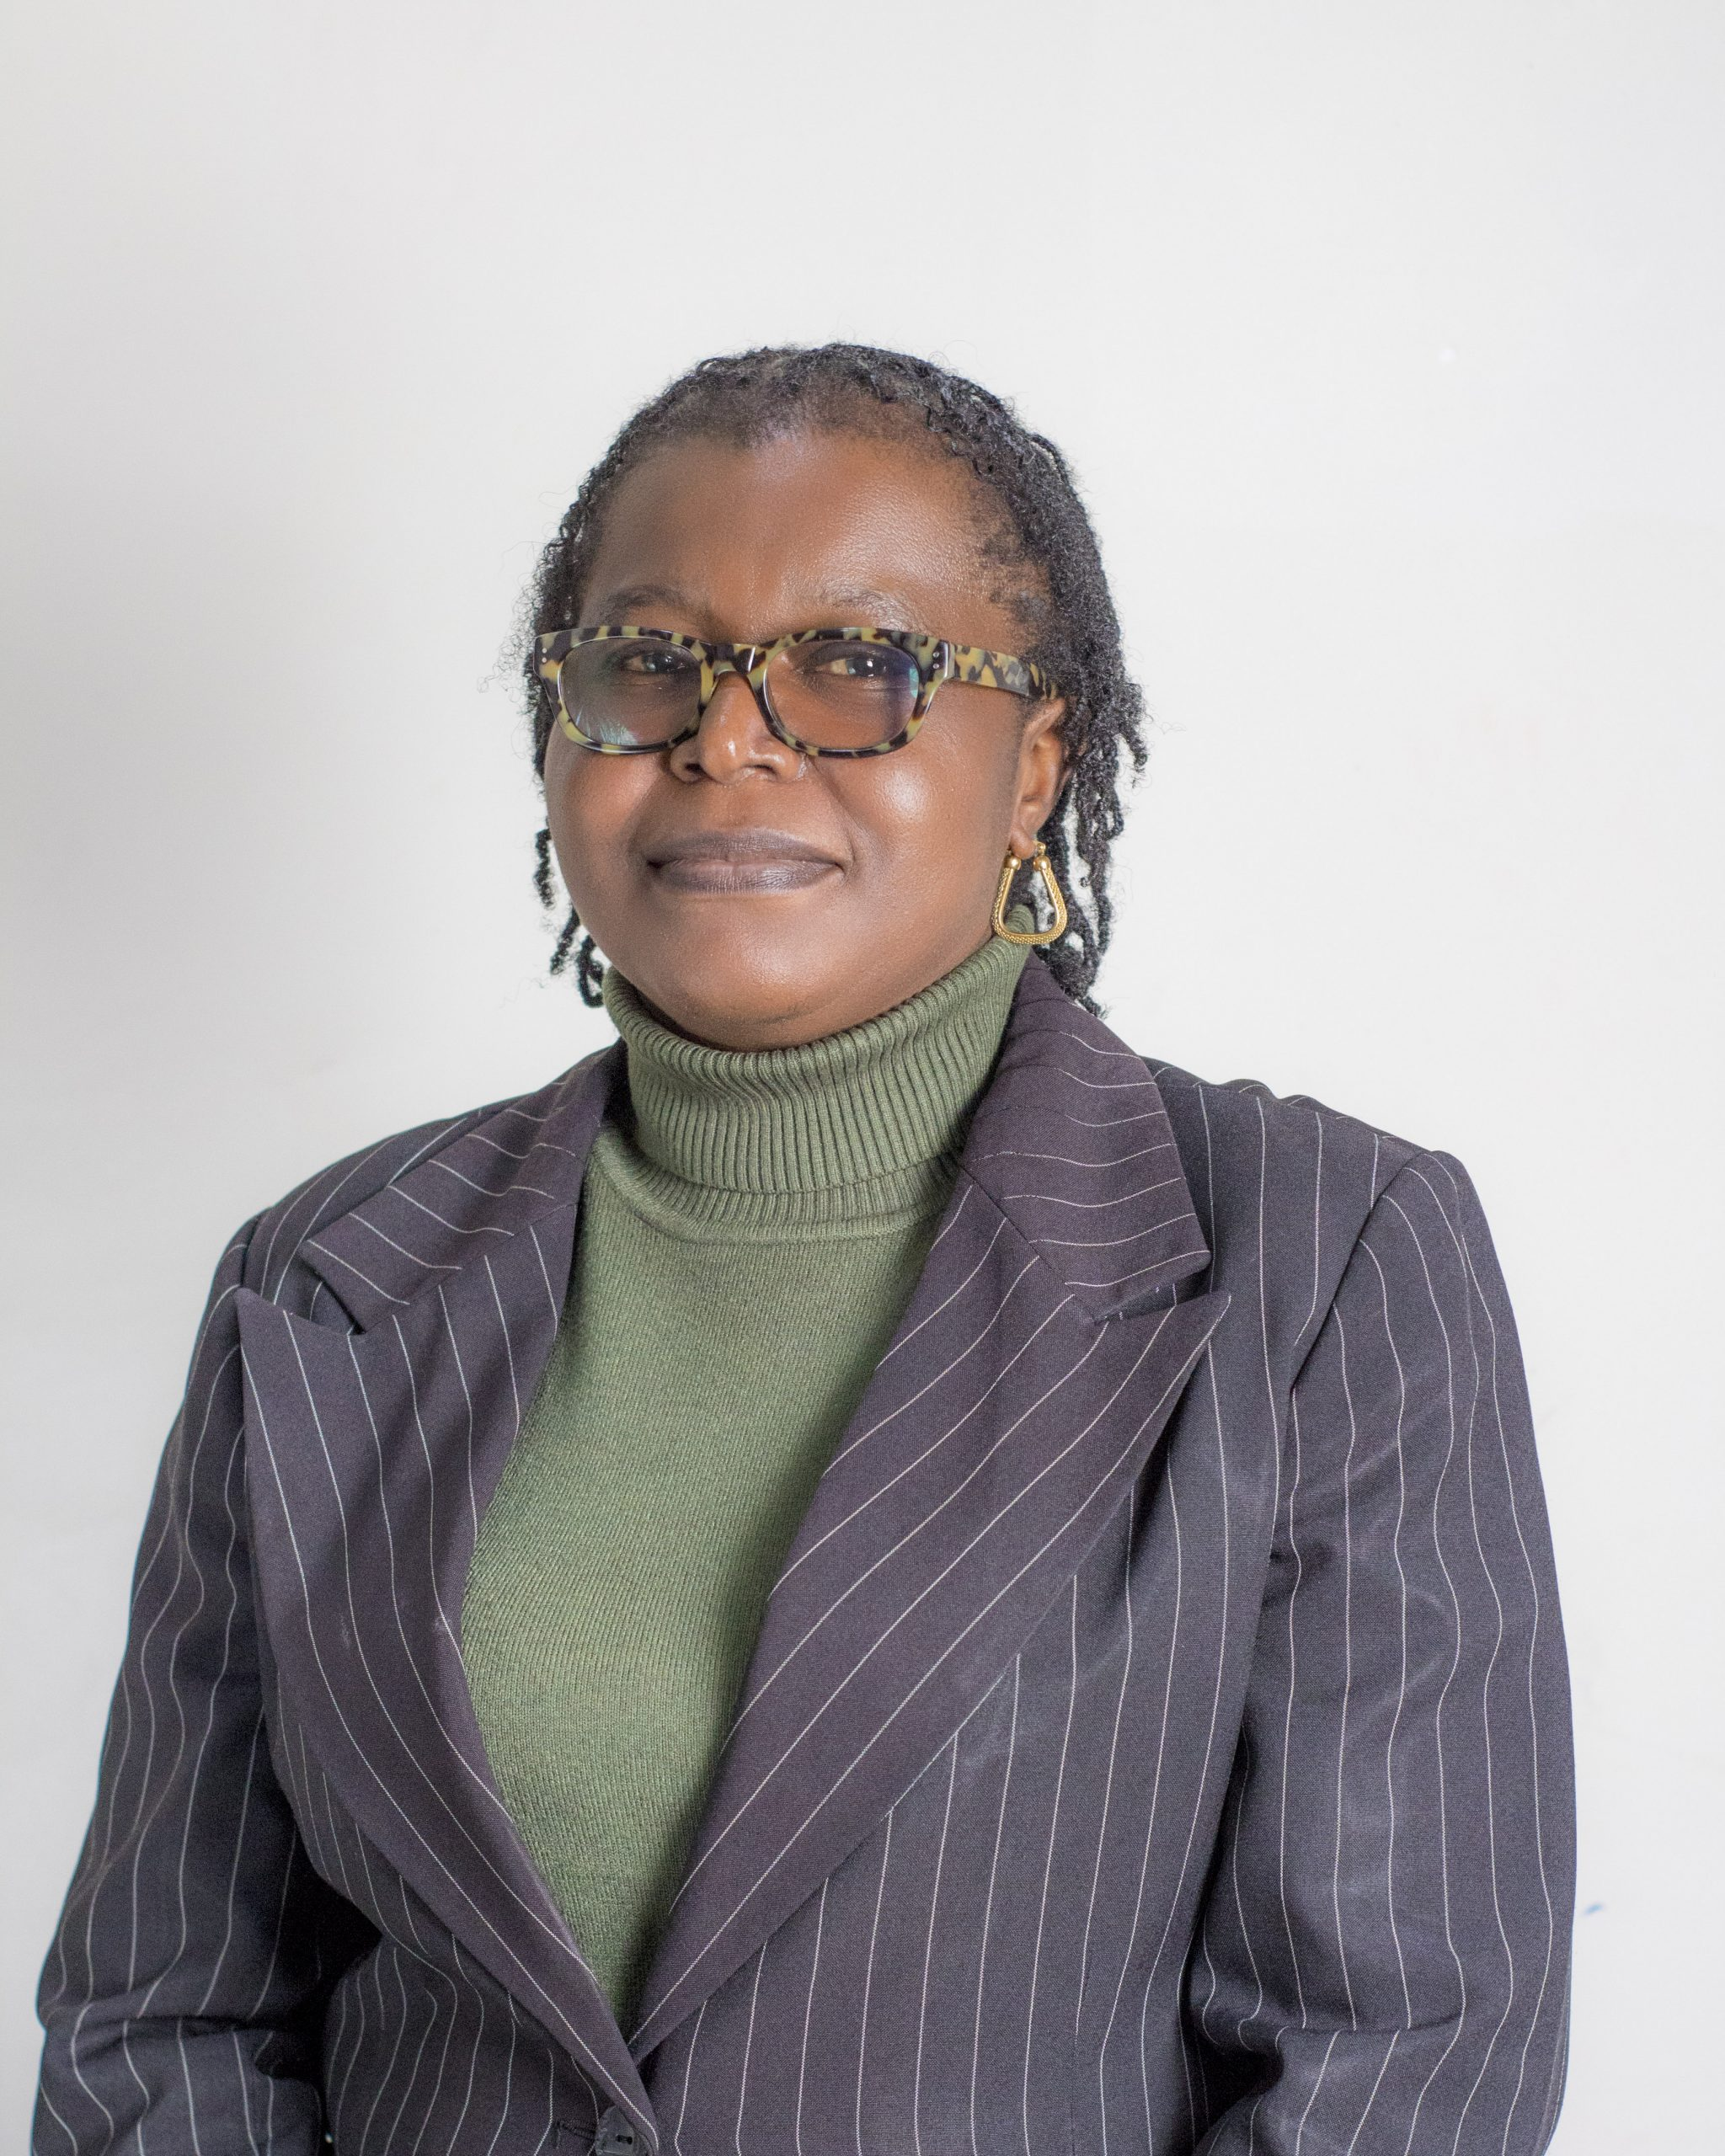 Ifeoma Egbunike